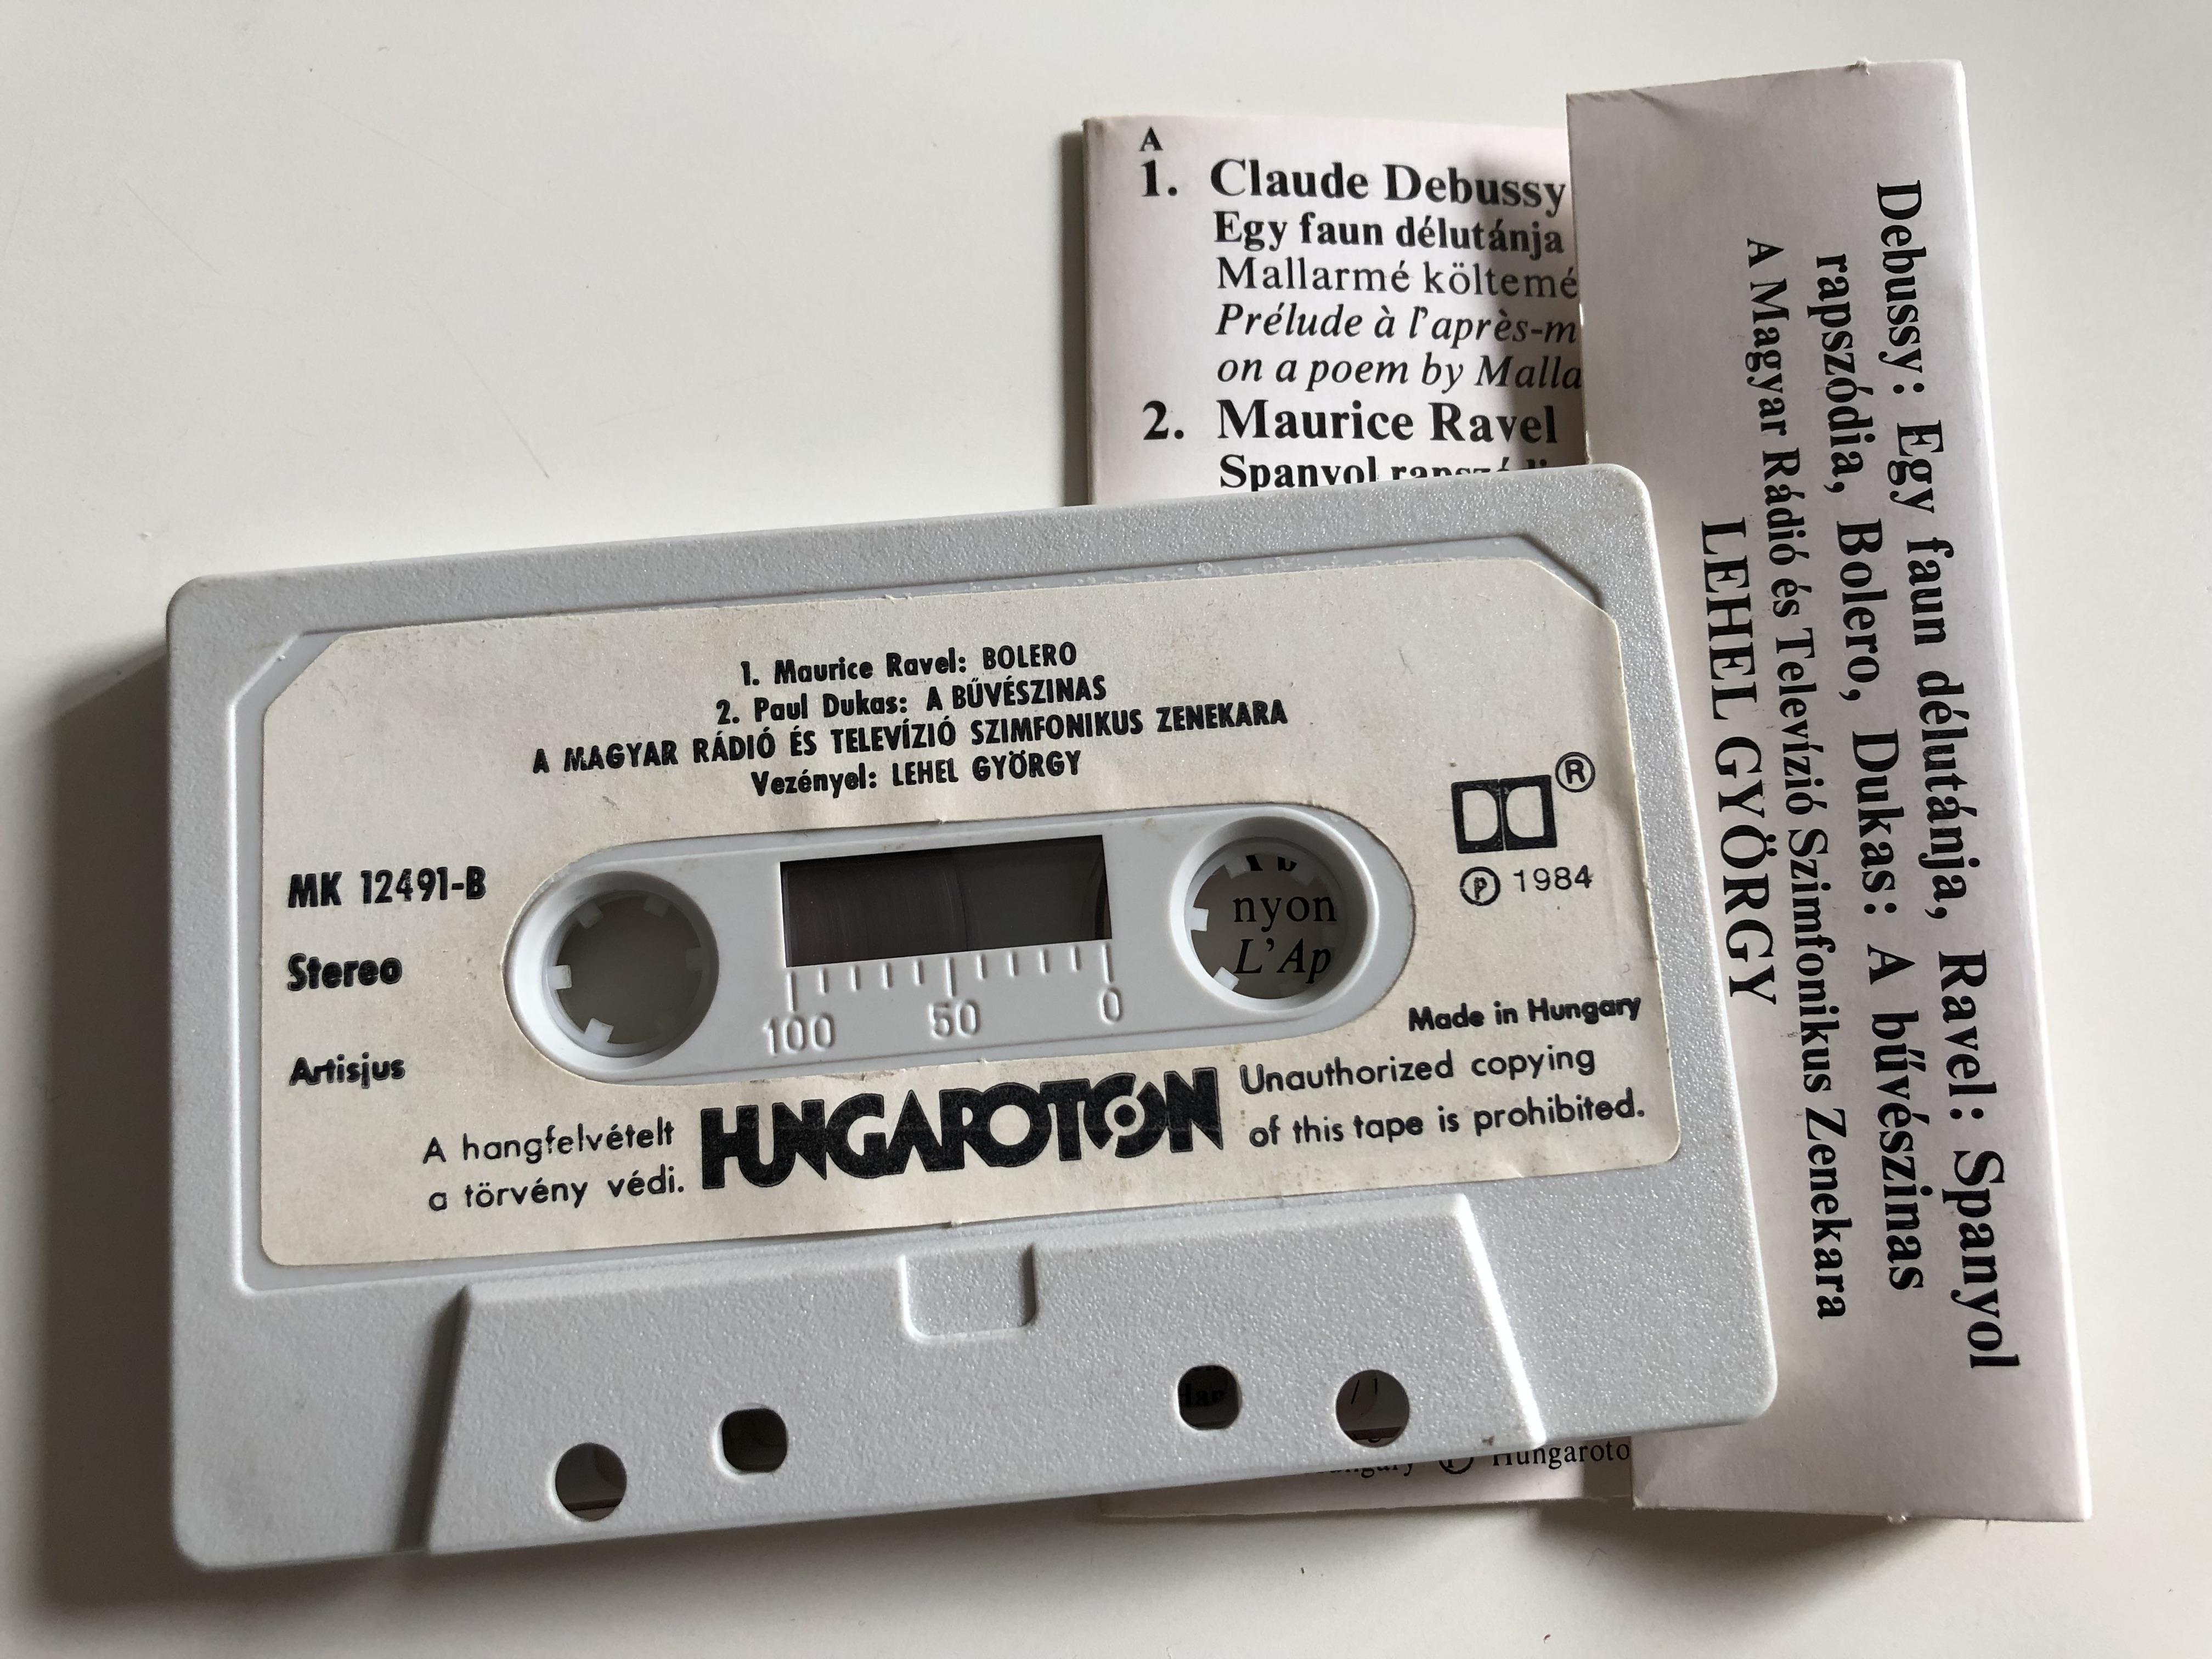 bolero-debussy-pr-lude-l-apr-s-midi-d-un-faune-ravel-rapsodie-espanole-bolero-dukas-l-apprenti-sorcier-budapest-symphony-orchestra-conducted-gy-rgy-lehel-hungaroton-cassette-stereo-3-.jpg